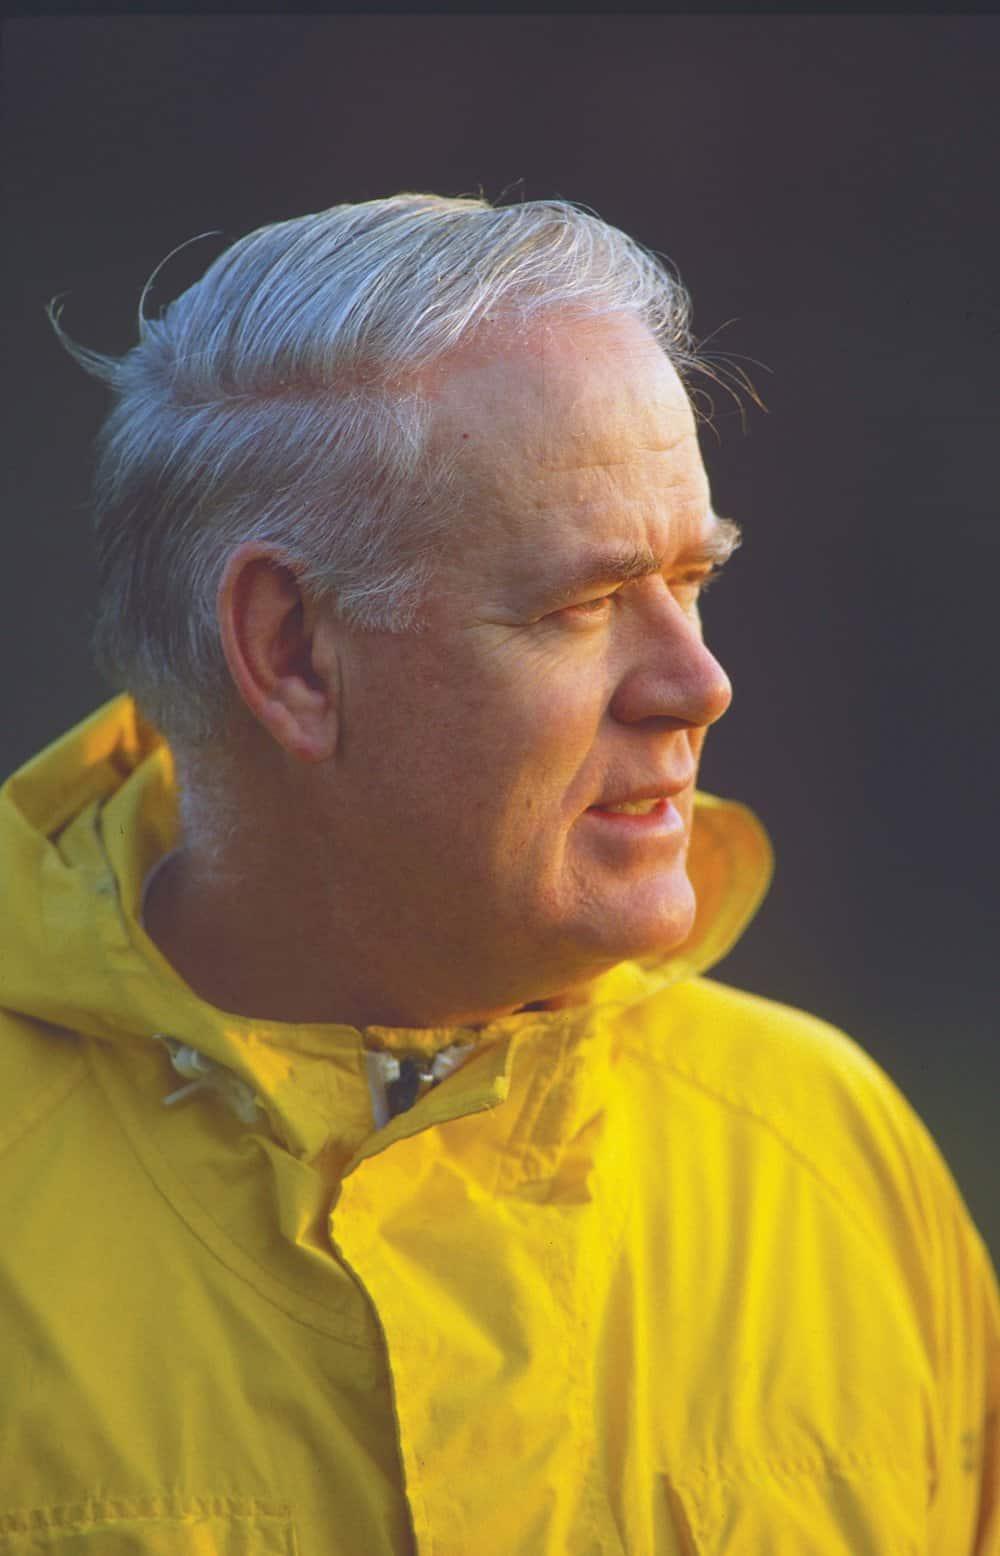 Ken Garrett